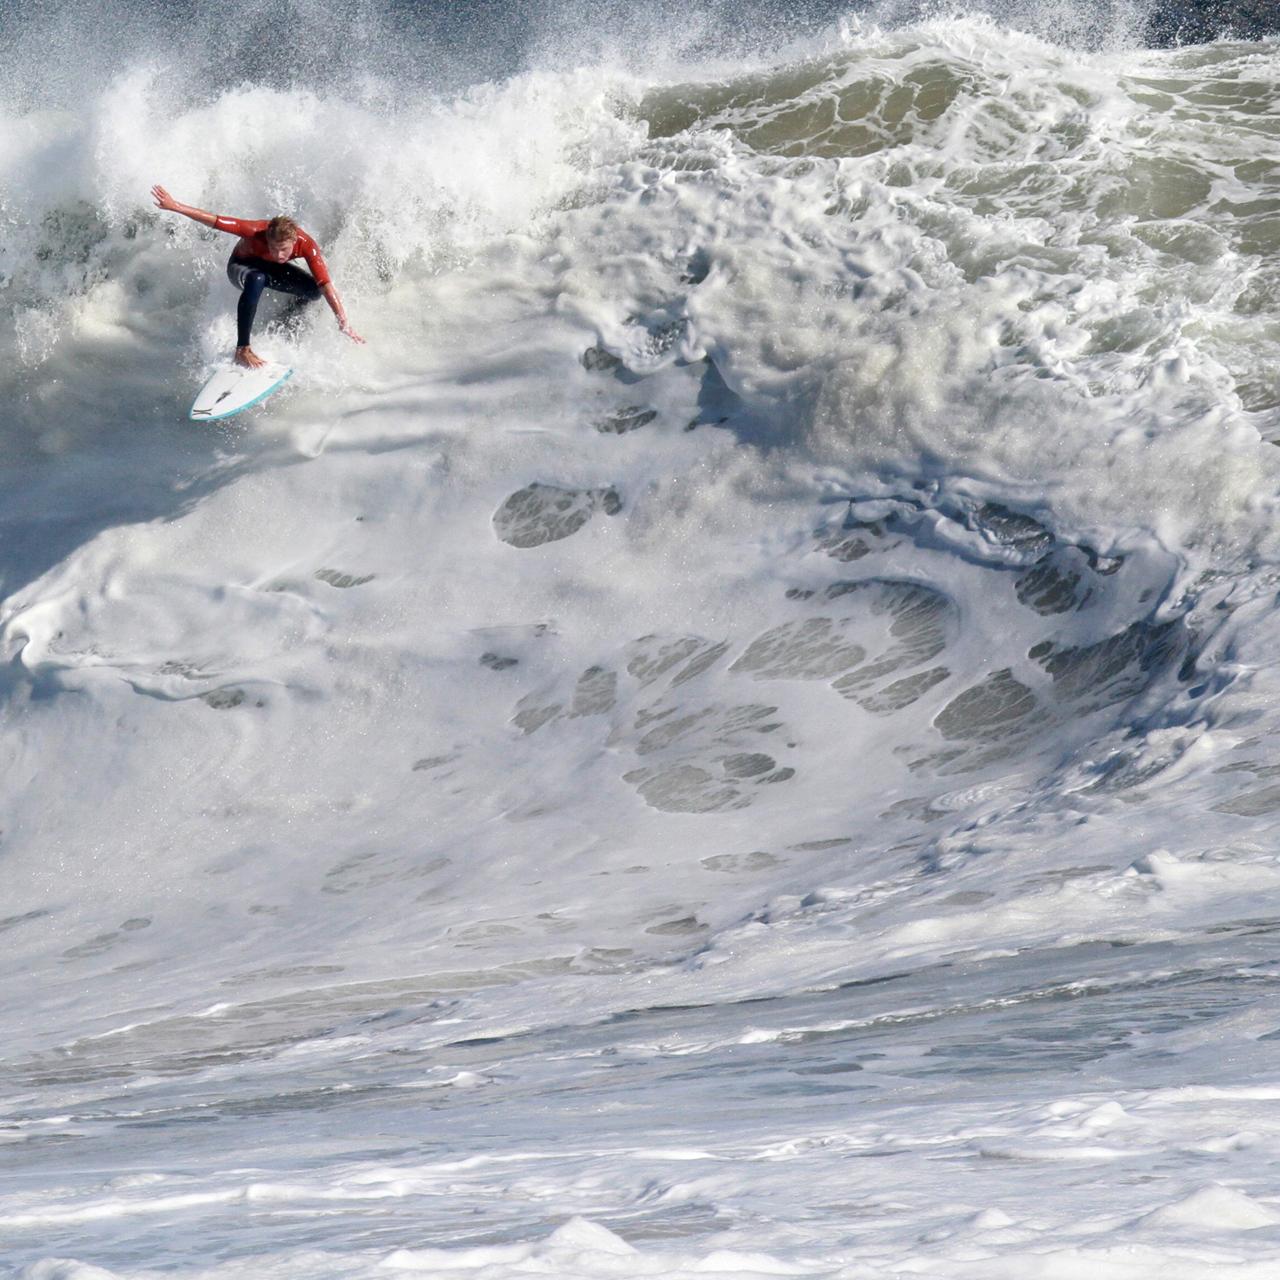 Crop - Jordan Collins Shreds The Wedge | Hurricane Marie, August 27th, 2014